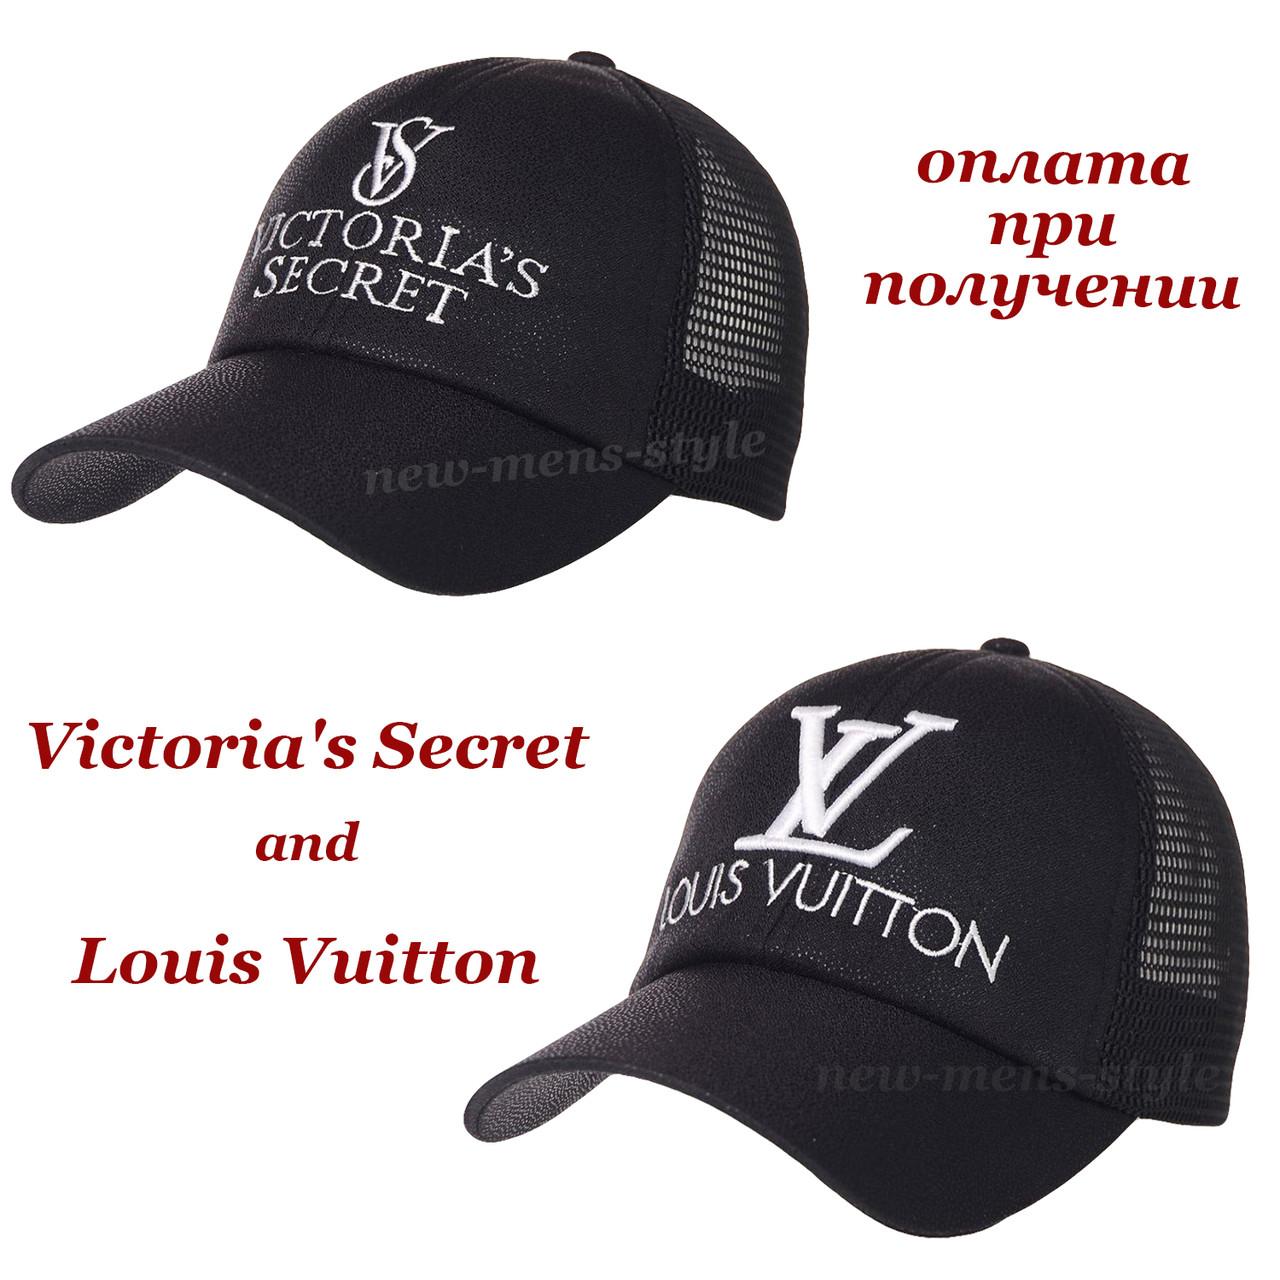 Женская кепка бейсболка в сетку Victoria's Secret и Louis Vuitton на липучке